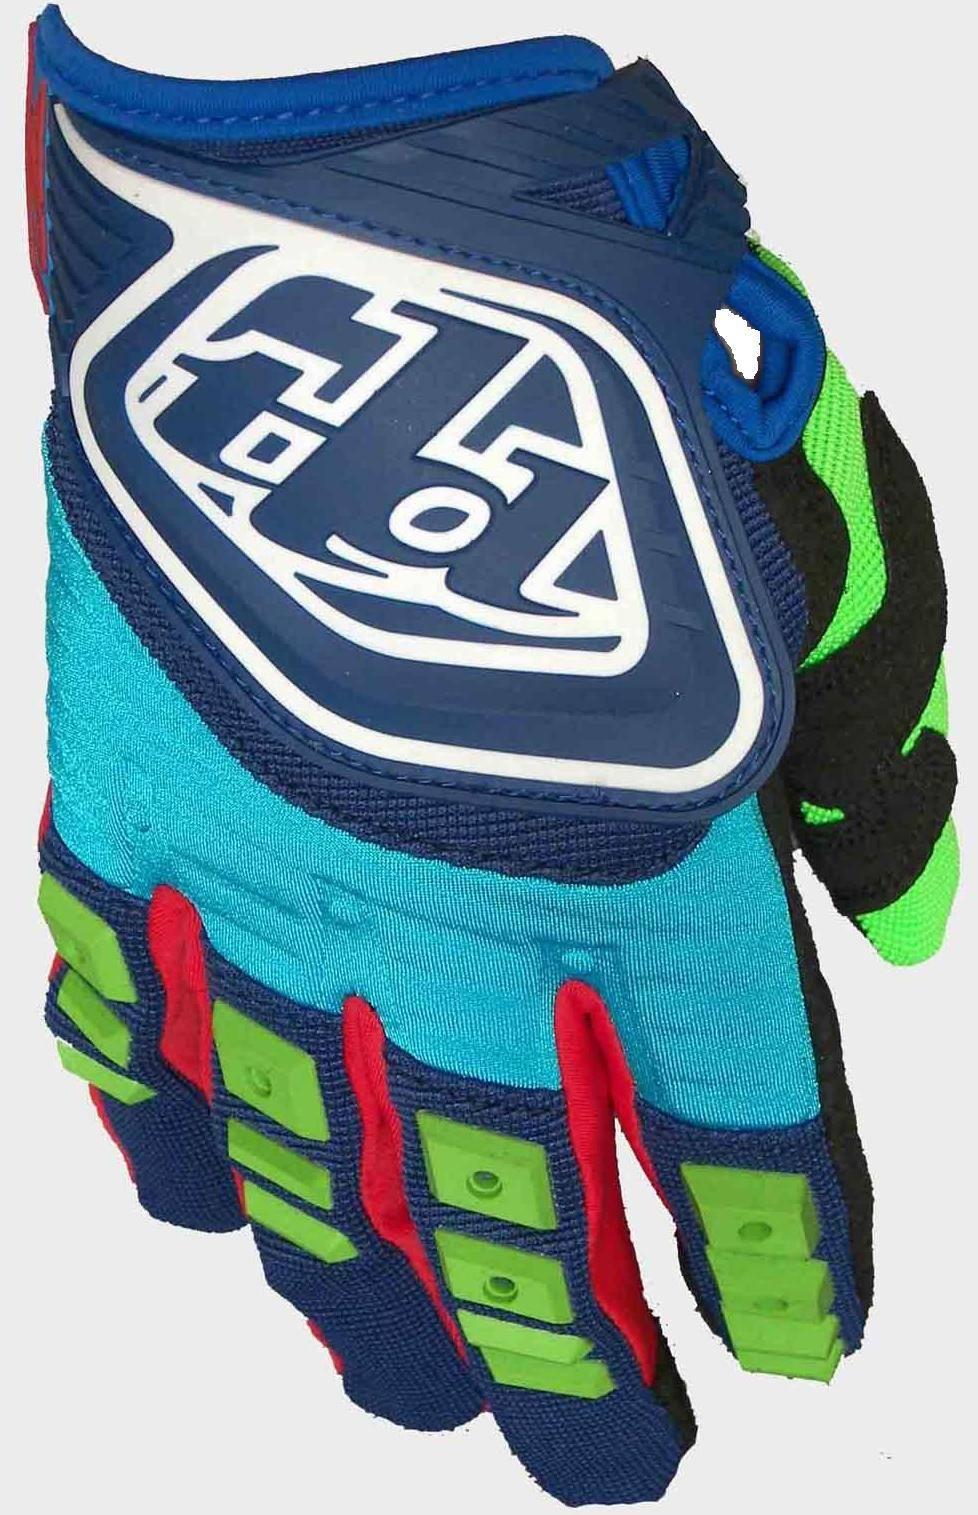 Troy Lee Designs Grand Prix glove moutain bike tld biking gloves moto gloves racing gloves